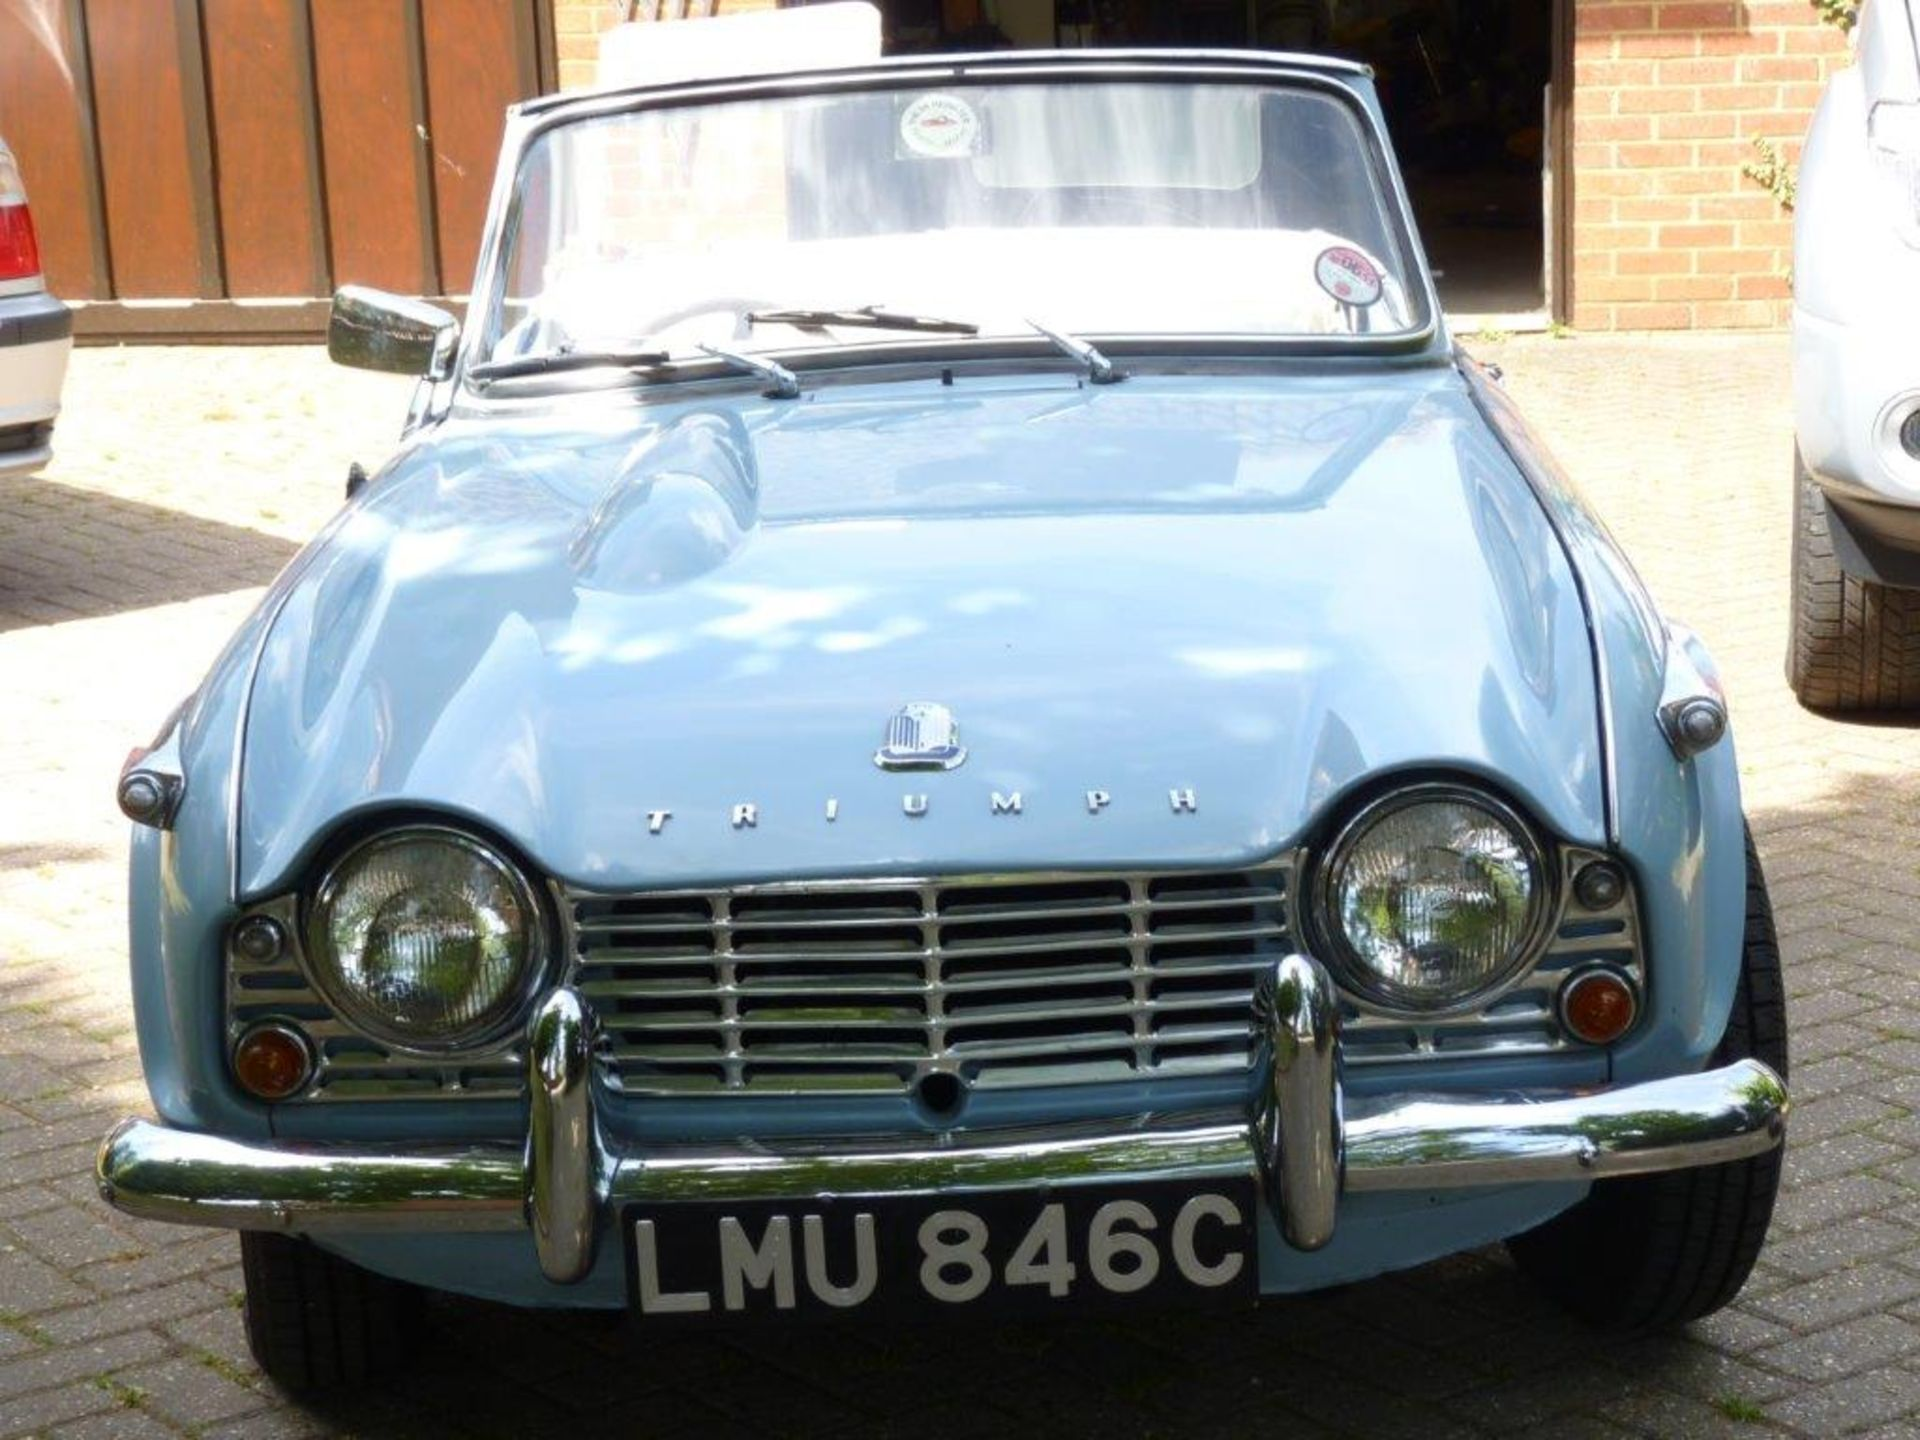 1965 Triumph TR4 - Image 7 of 17